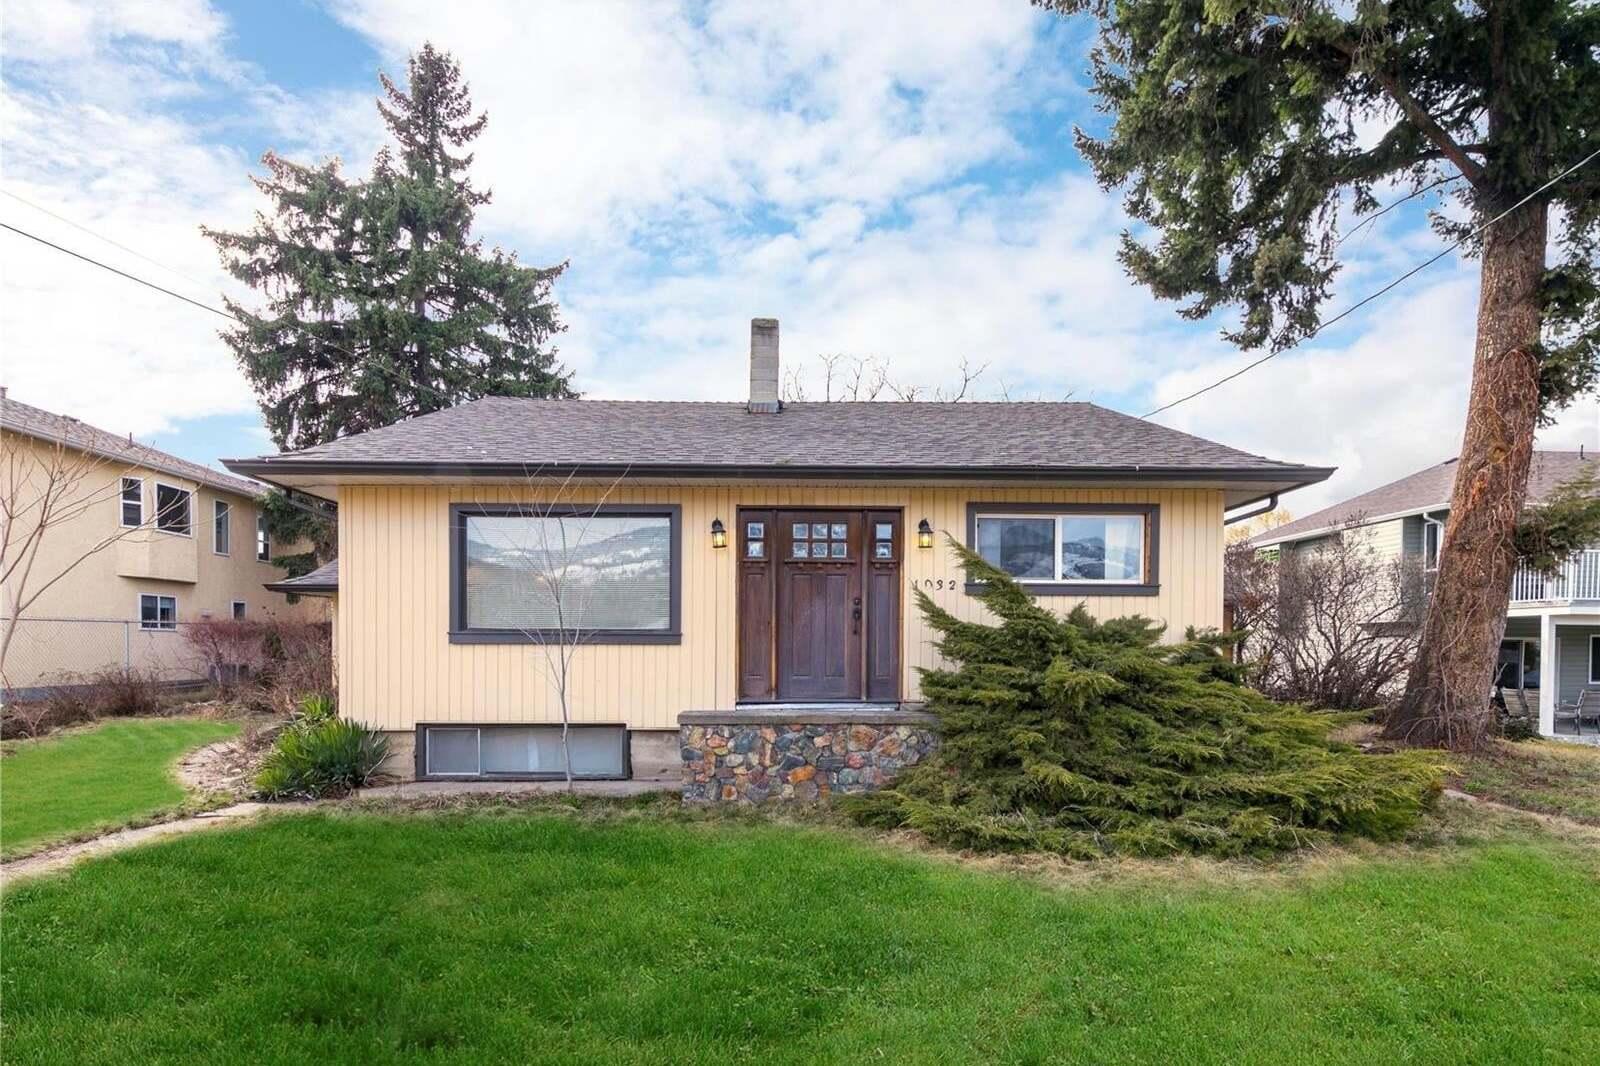 House for sale at 1032 Rutland Rd Kelowna British Columbia - MLS: 10201348